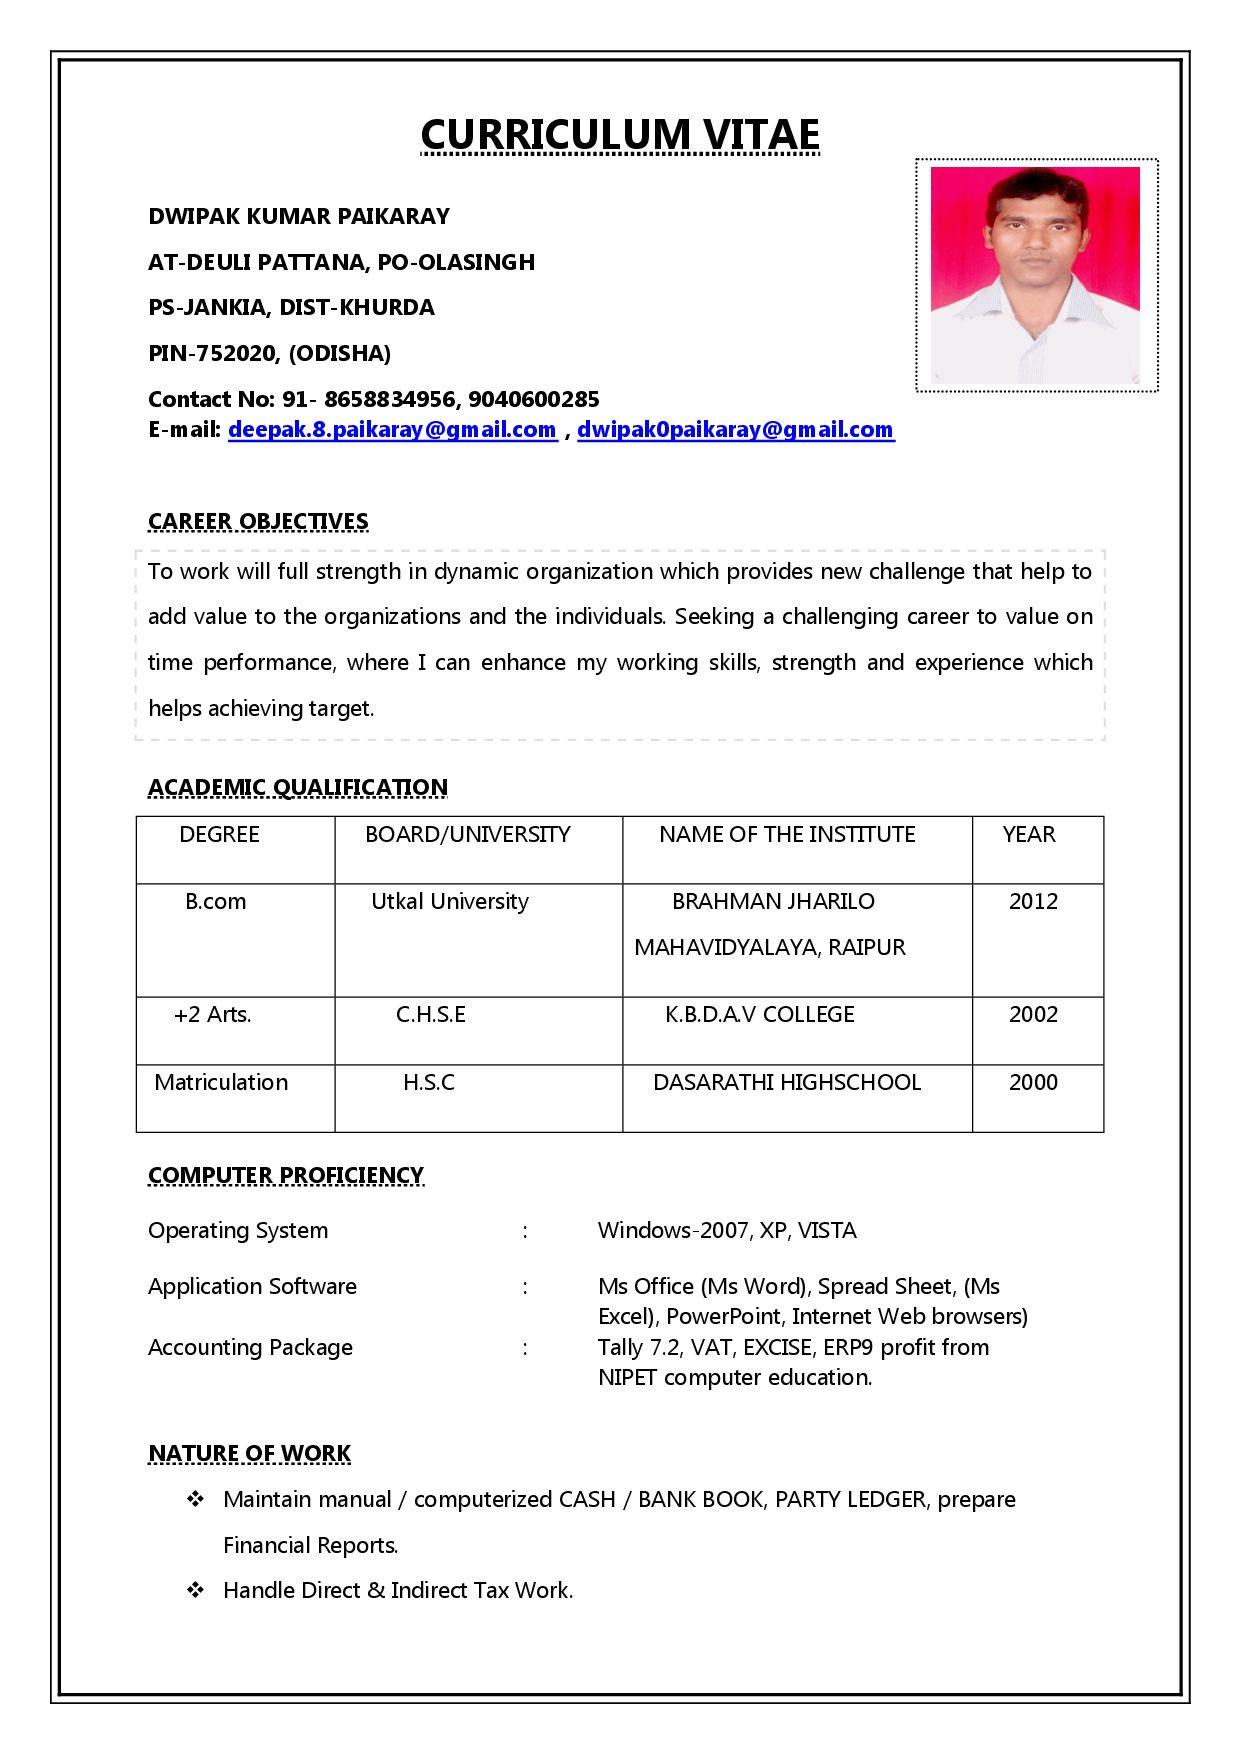 Sample Resume for Job Interview Pdf Resume format Job Interview - Resume format Job Resume, Job ...